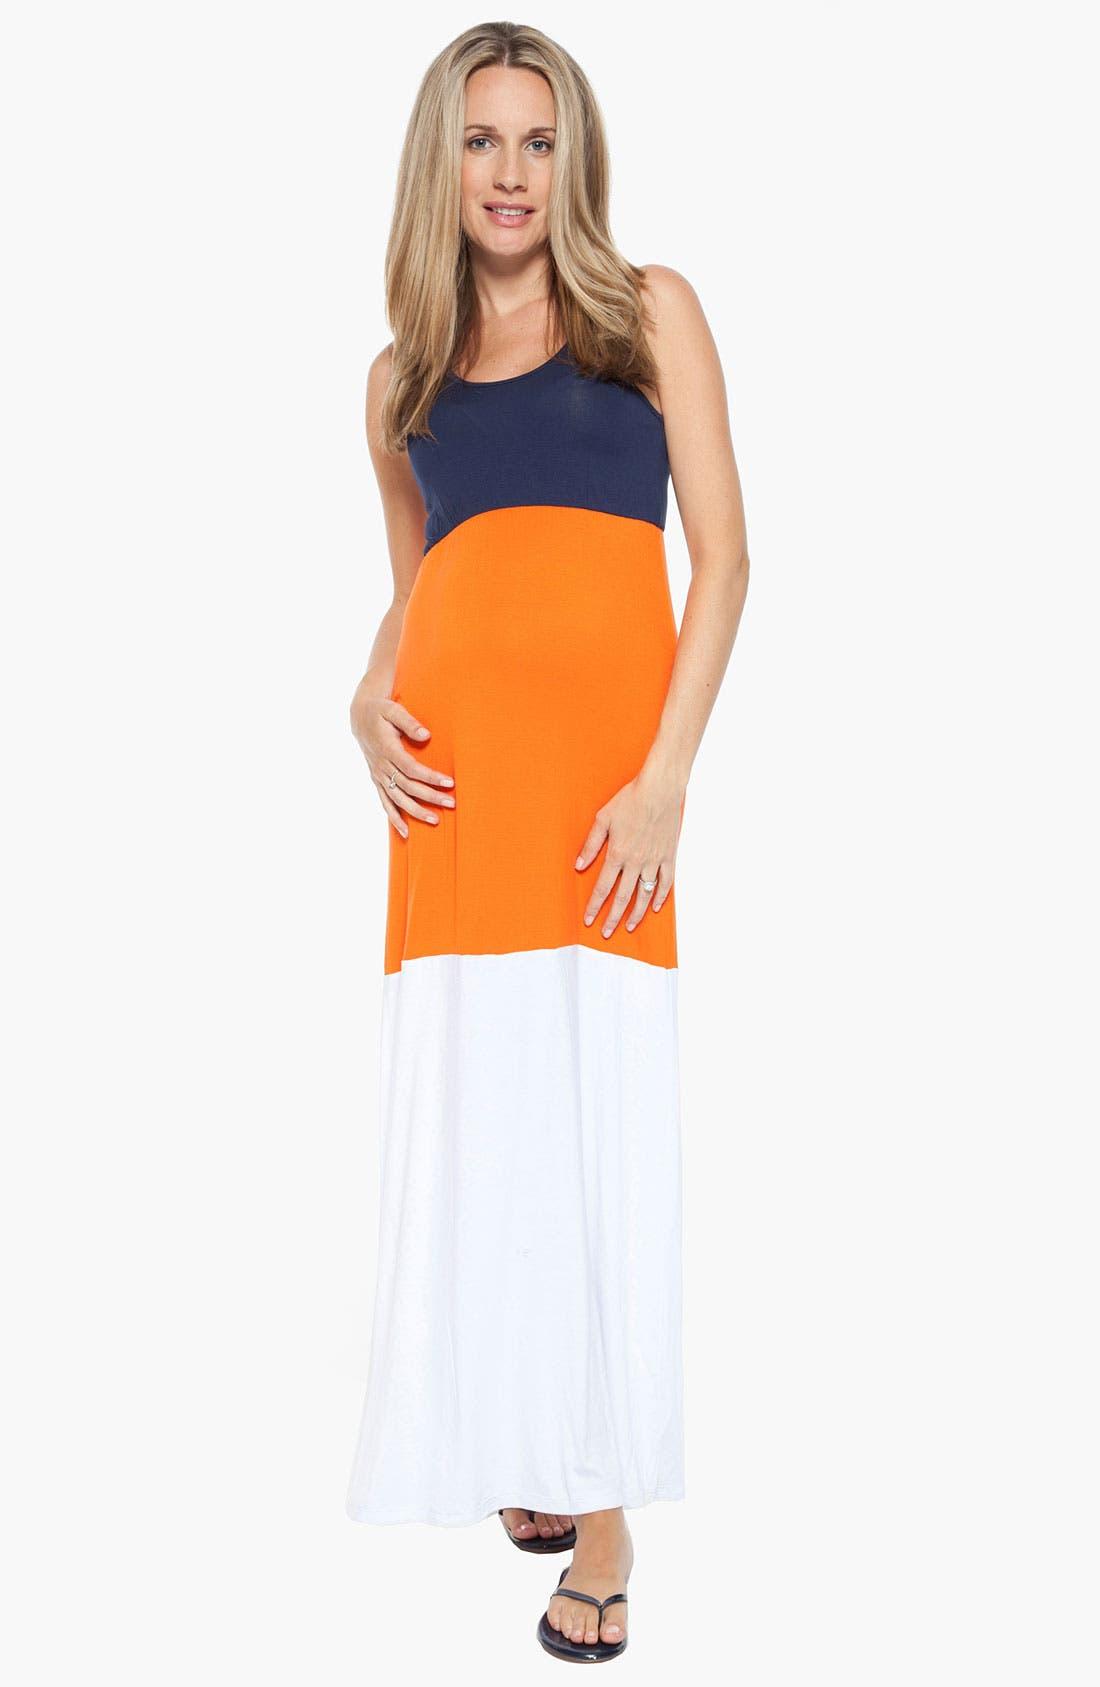 Alternate Image 1 Selected - Nom Maternity 'Gigi' Colorblock Maternity Maxi Dress